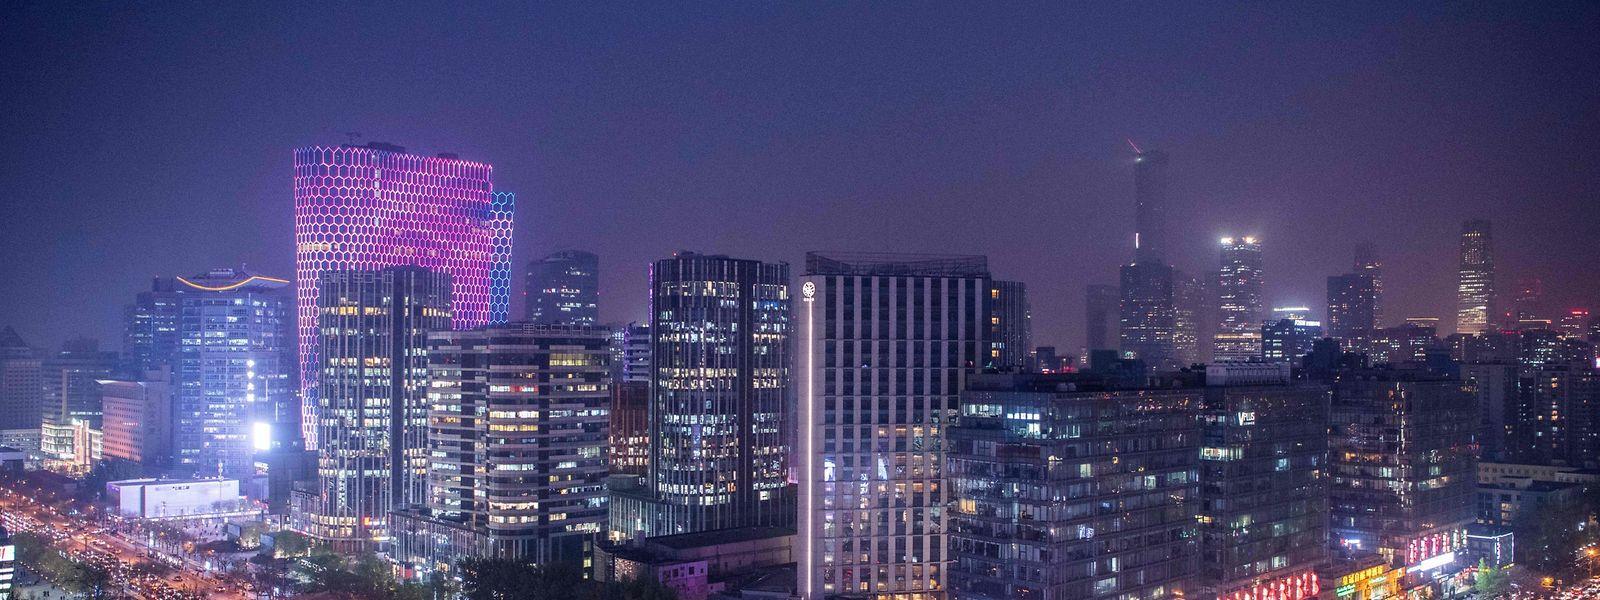 Die Millionenmetropole Peking bei Nacht.